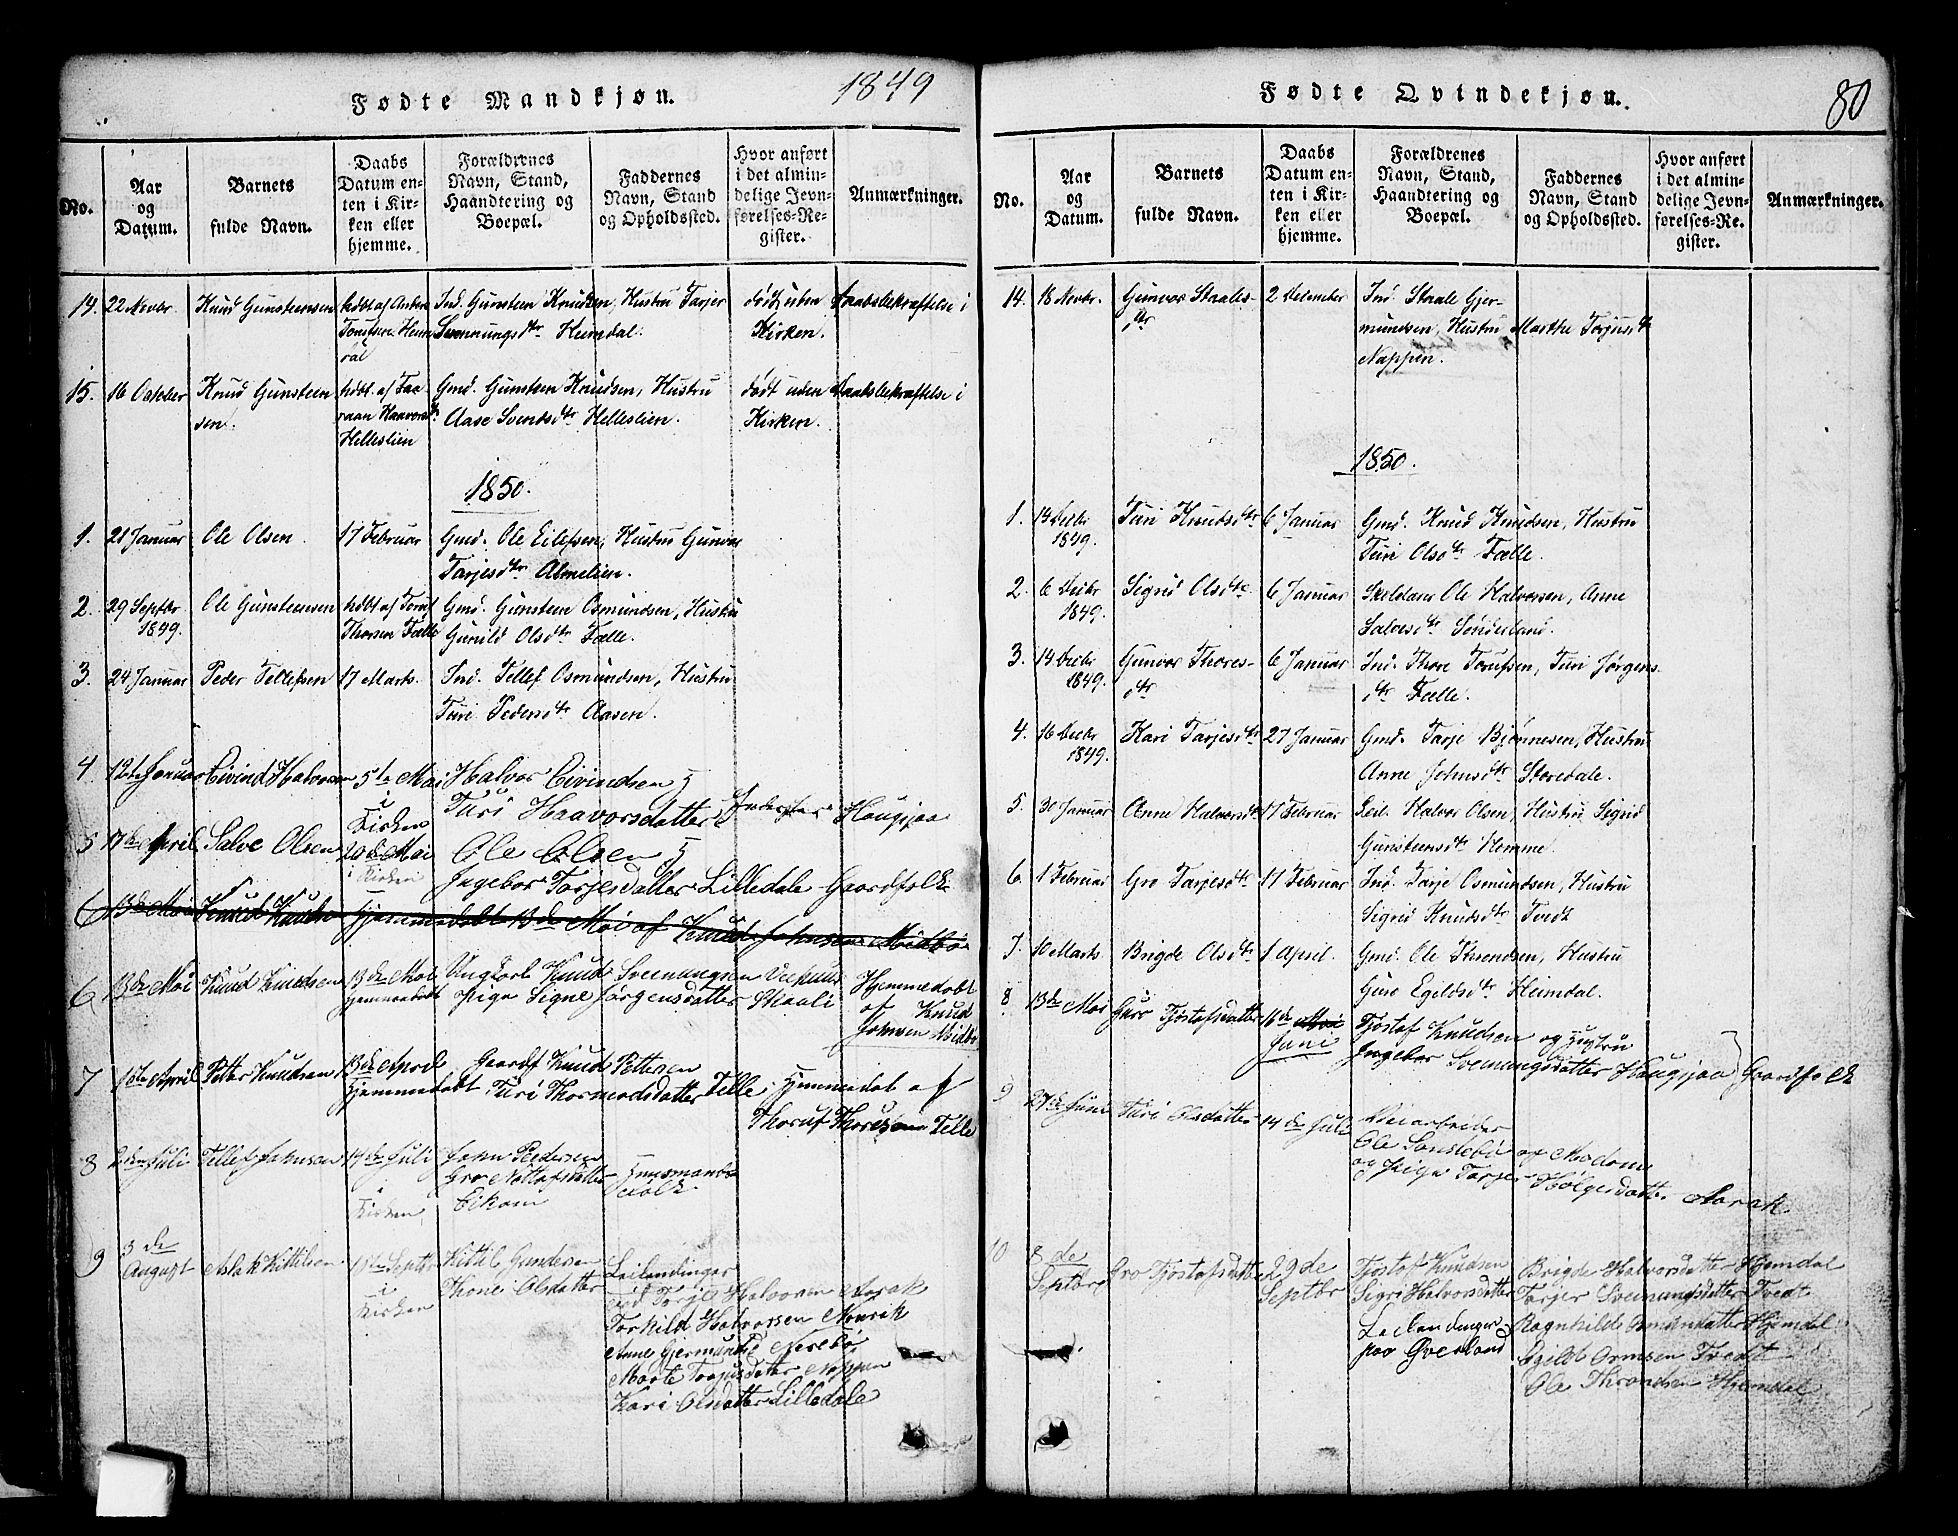 SAKO, Nissedal kirkebøker, G/Gb/L0001: Klokkerbok nr. II 1, 1814-1862, s. 80